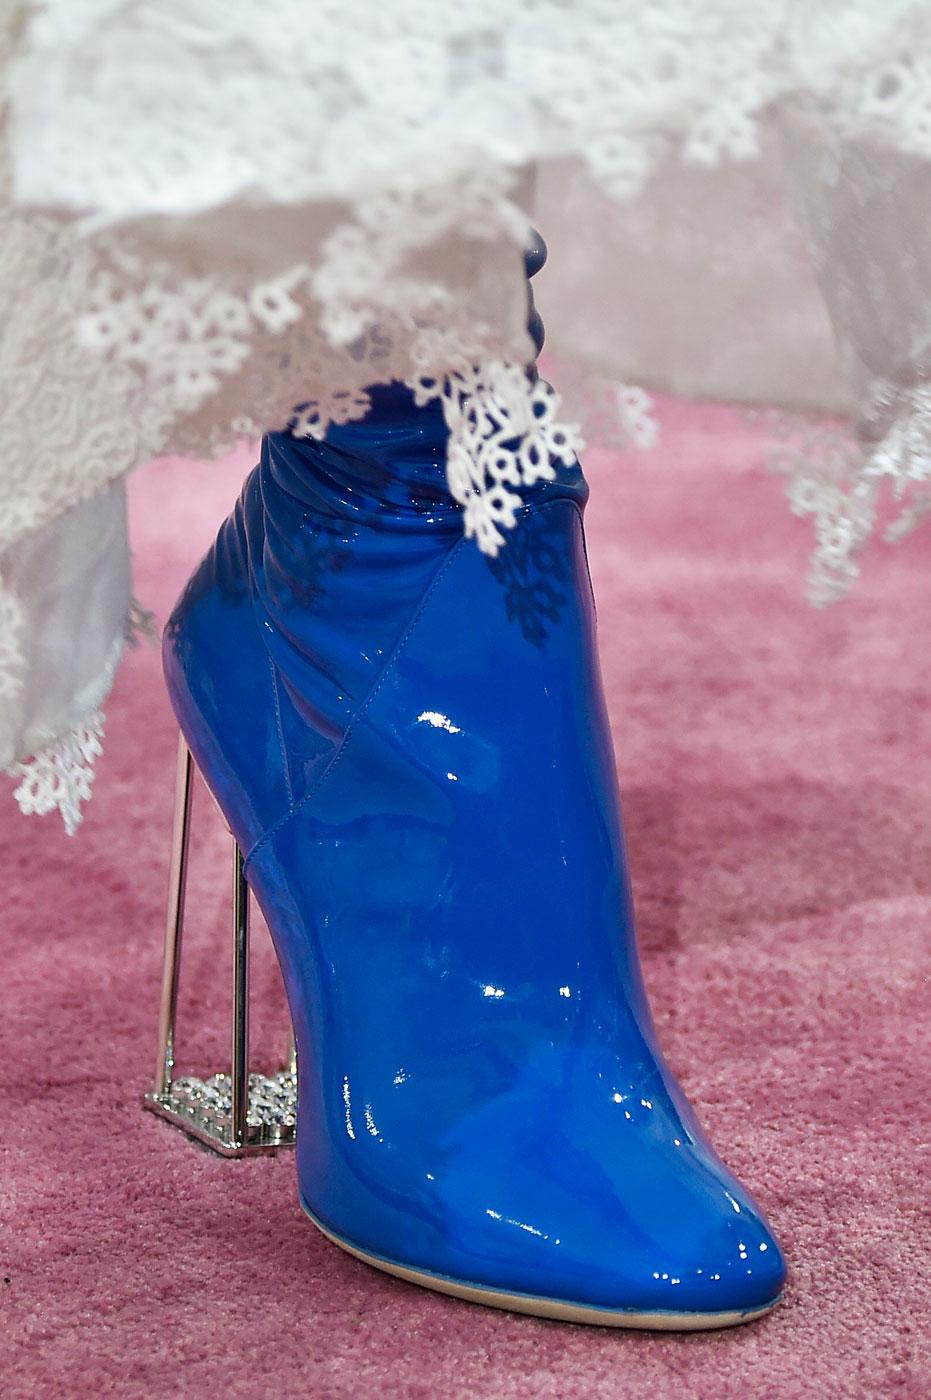 Christian-Dior-fashion-runway-show-close-ups-haute-couture-paris-spring-summer-2015-the-impression-140